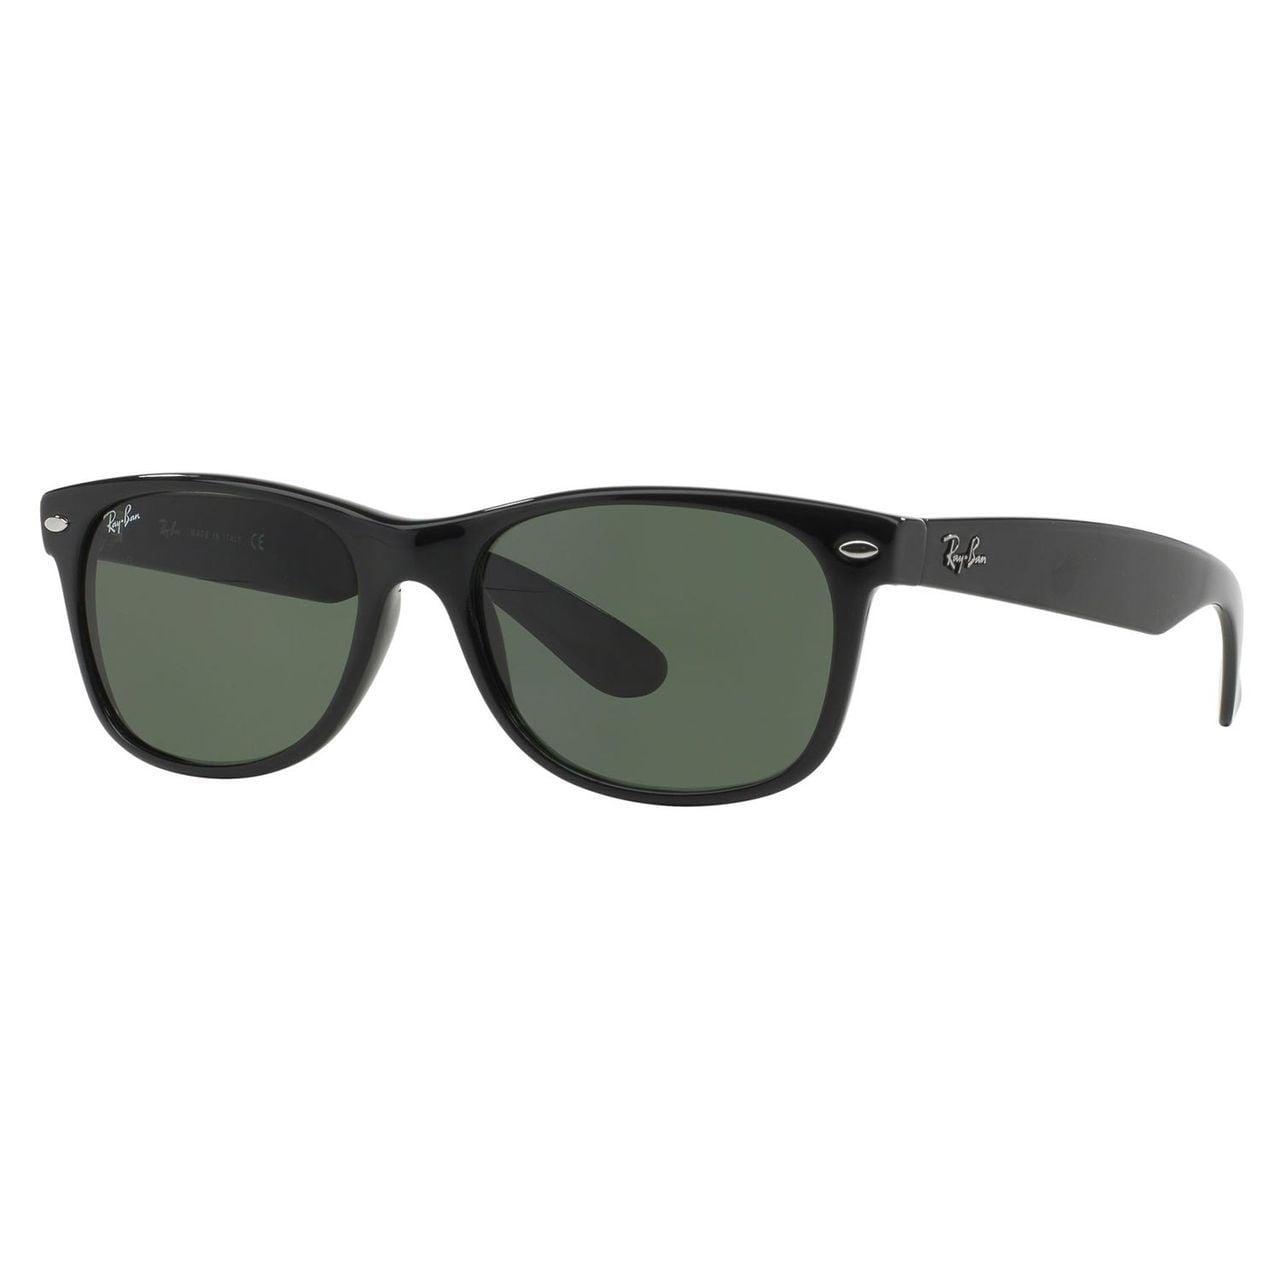 49aba58069a Ray-Ban New Wayfarer Classic RB 2132 Unisex Black Frame Green Classic Lens  Sunglasses